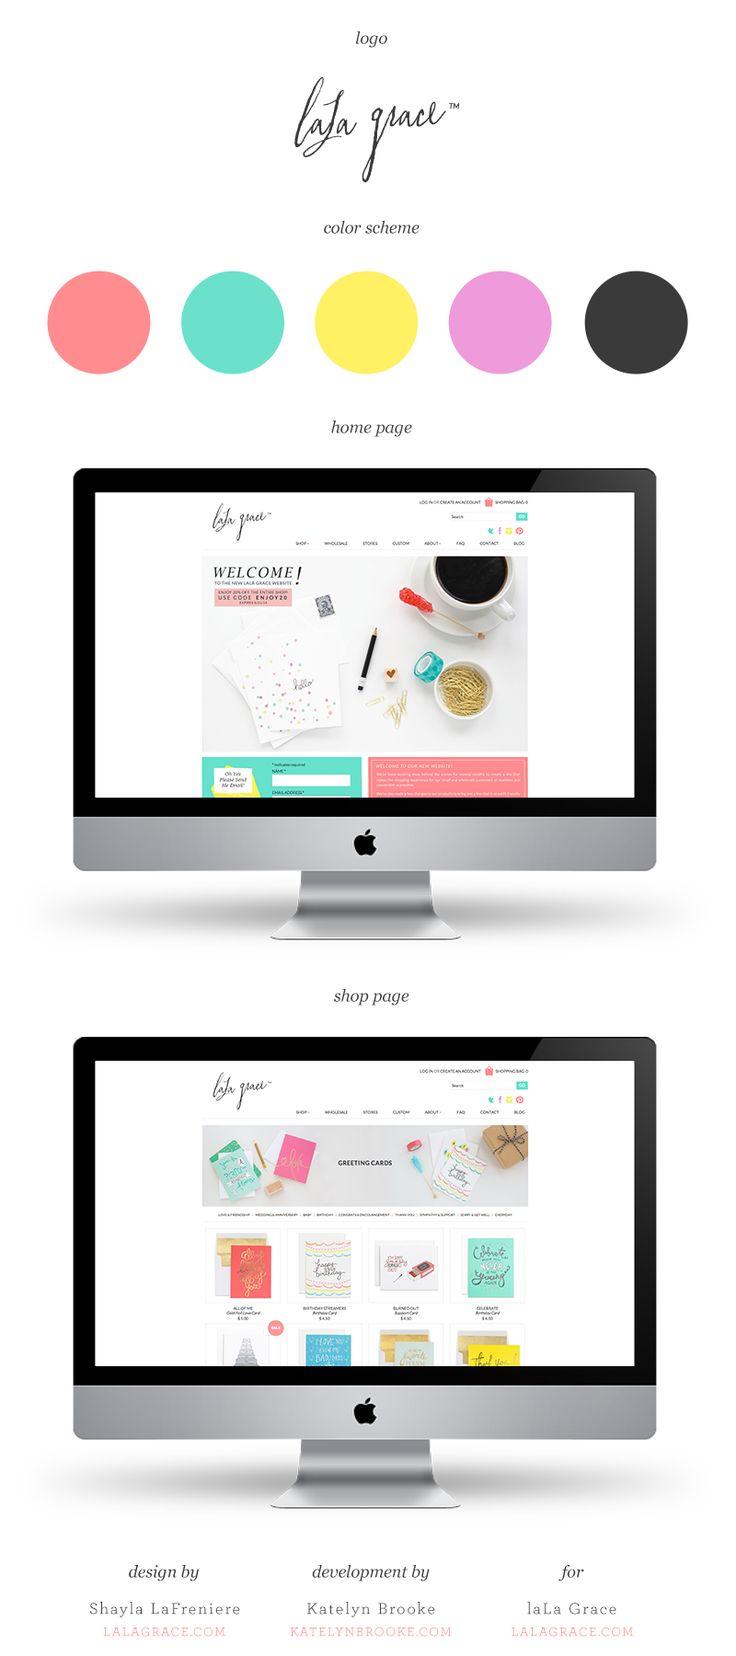 laLa Grace website, designed by Shayla LaFreniere with web development by Katelyn Brooke || katelynbrooke.com